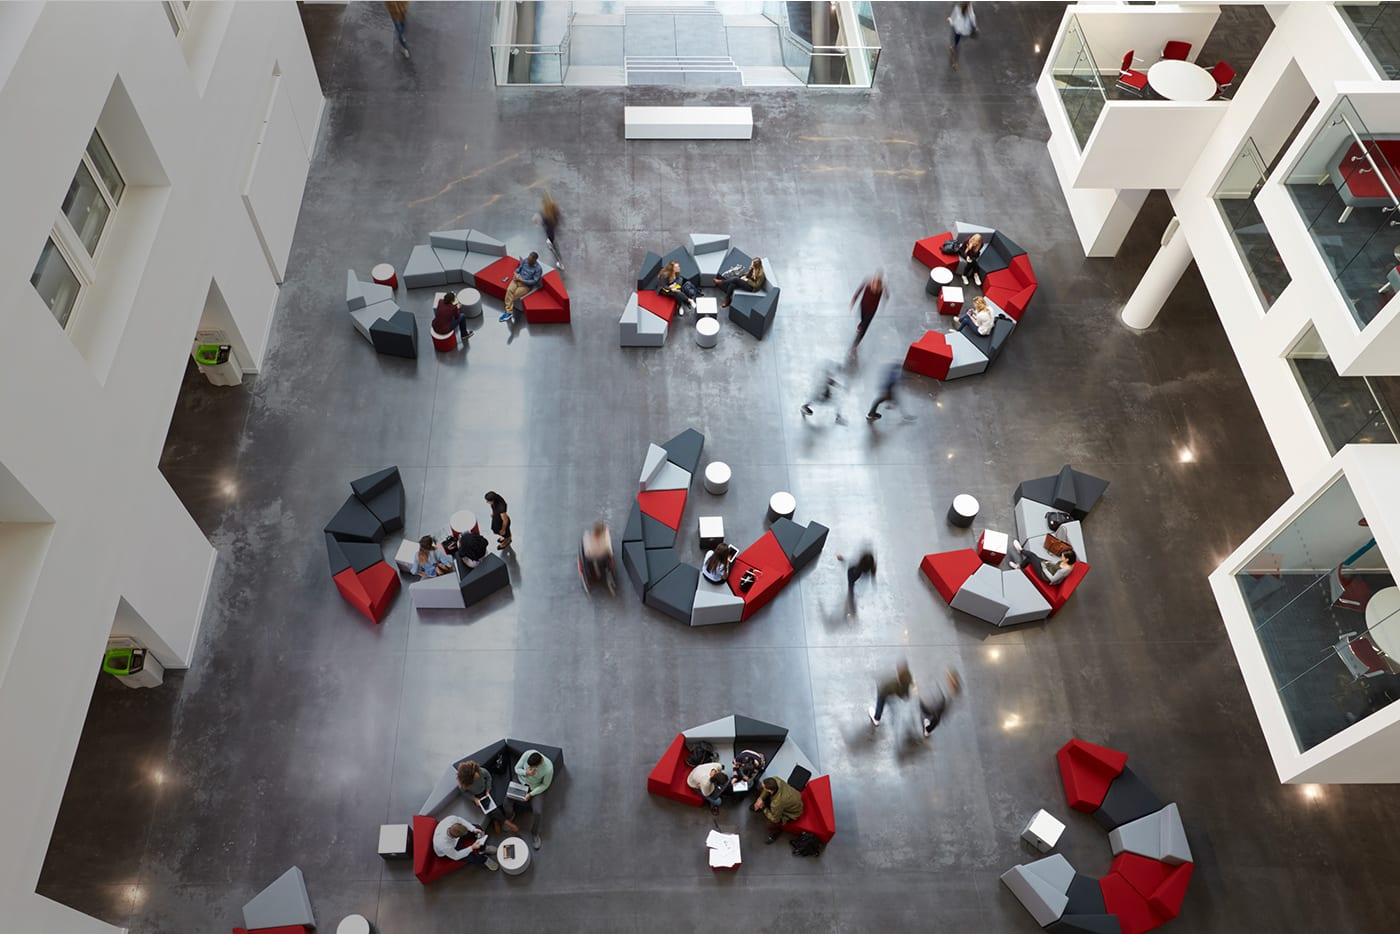 IPSK University Atrium